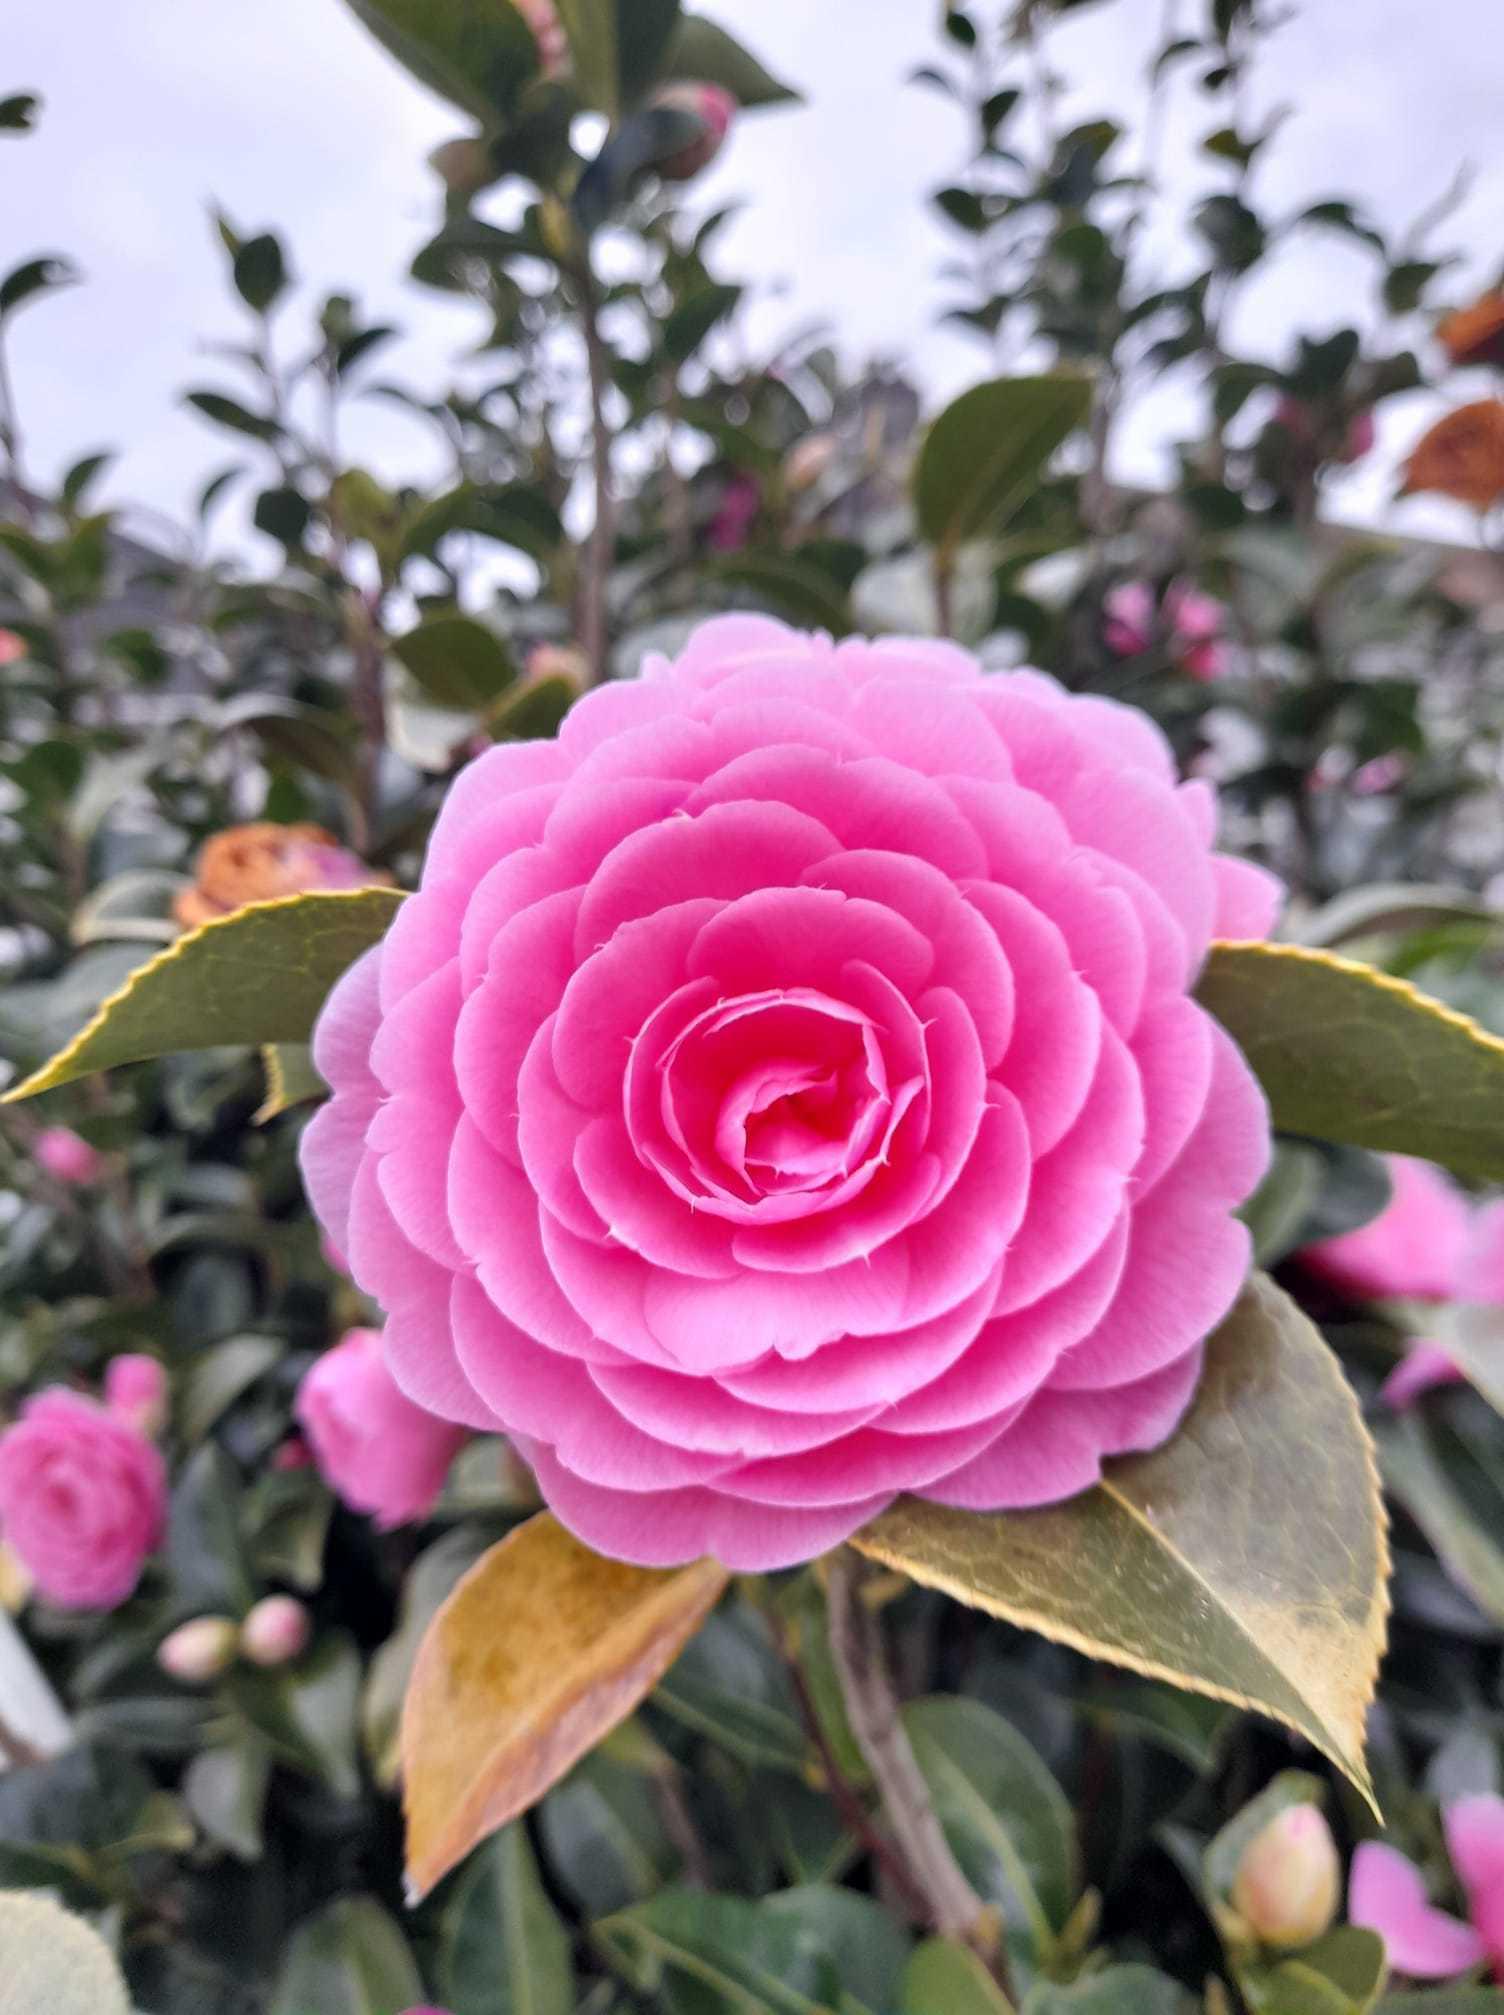 Beautiful blooming flower, by Graham Calvert